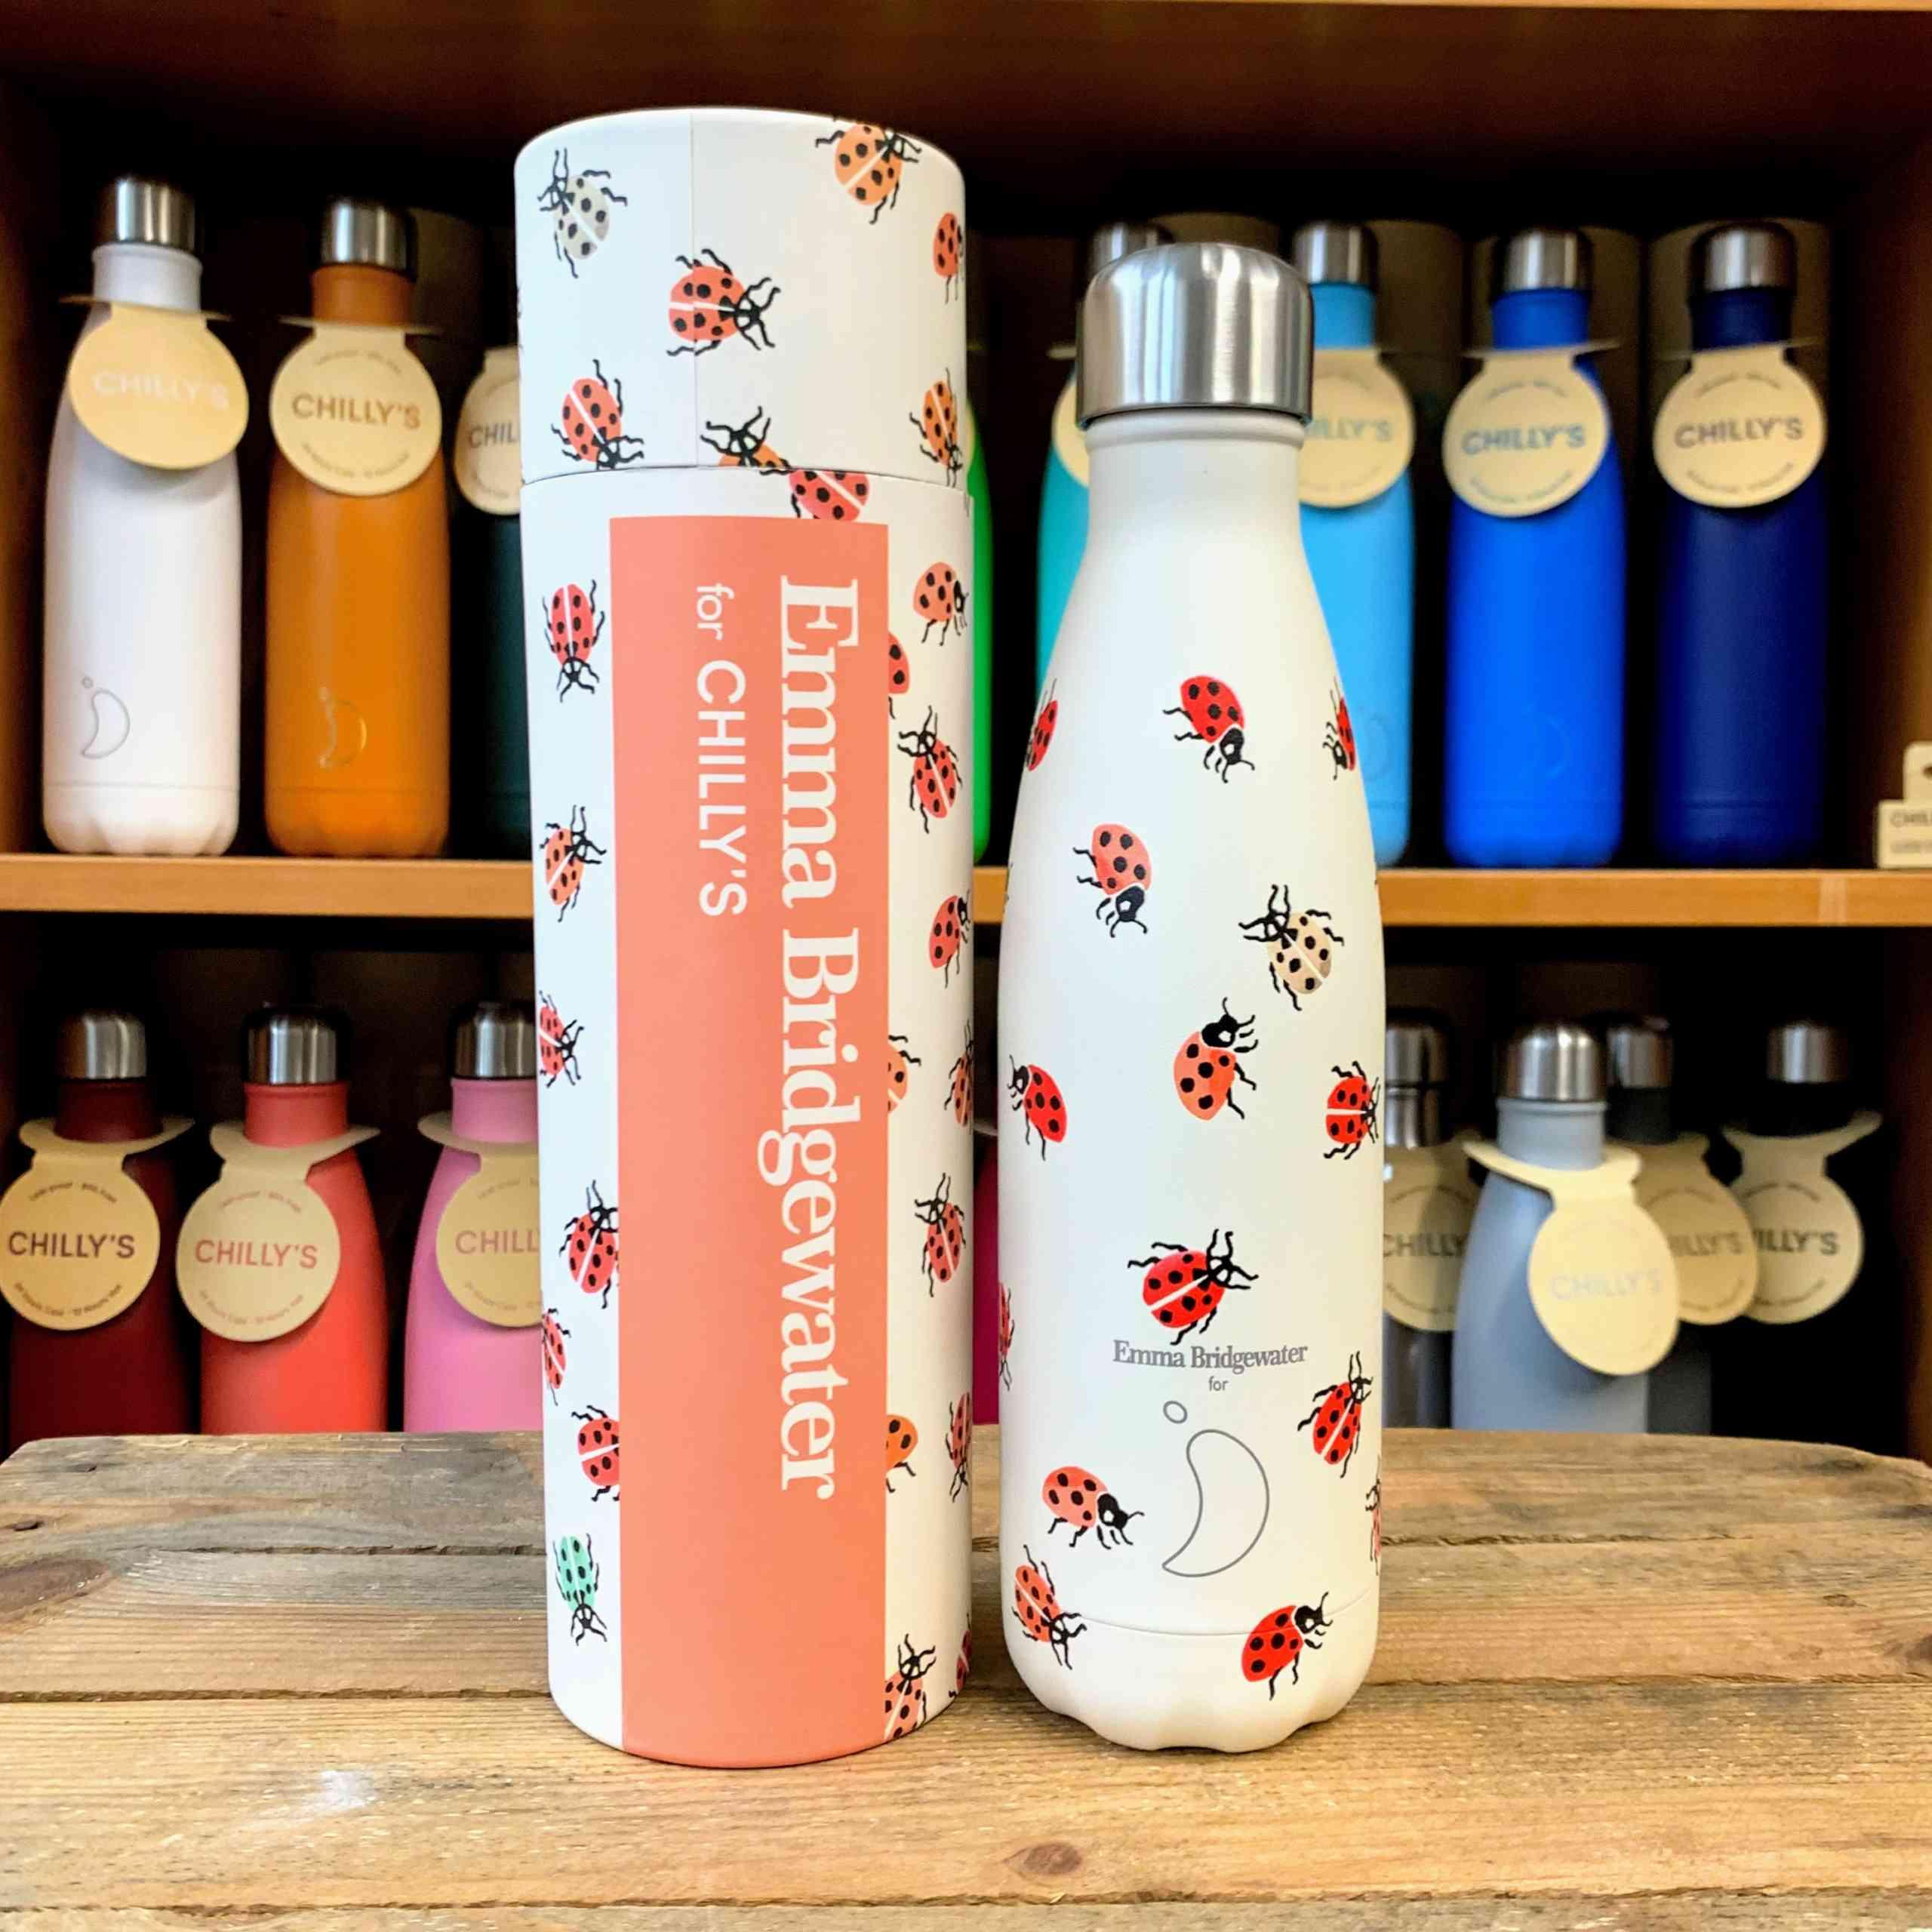 Emma Bridgewater Ladybirds Chilly's Bottle